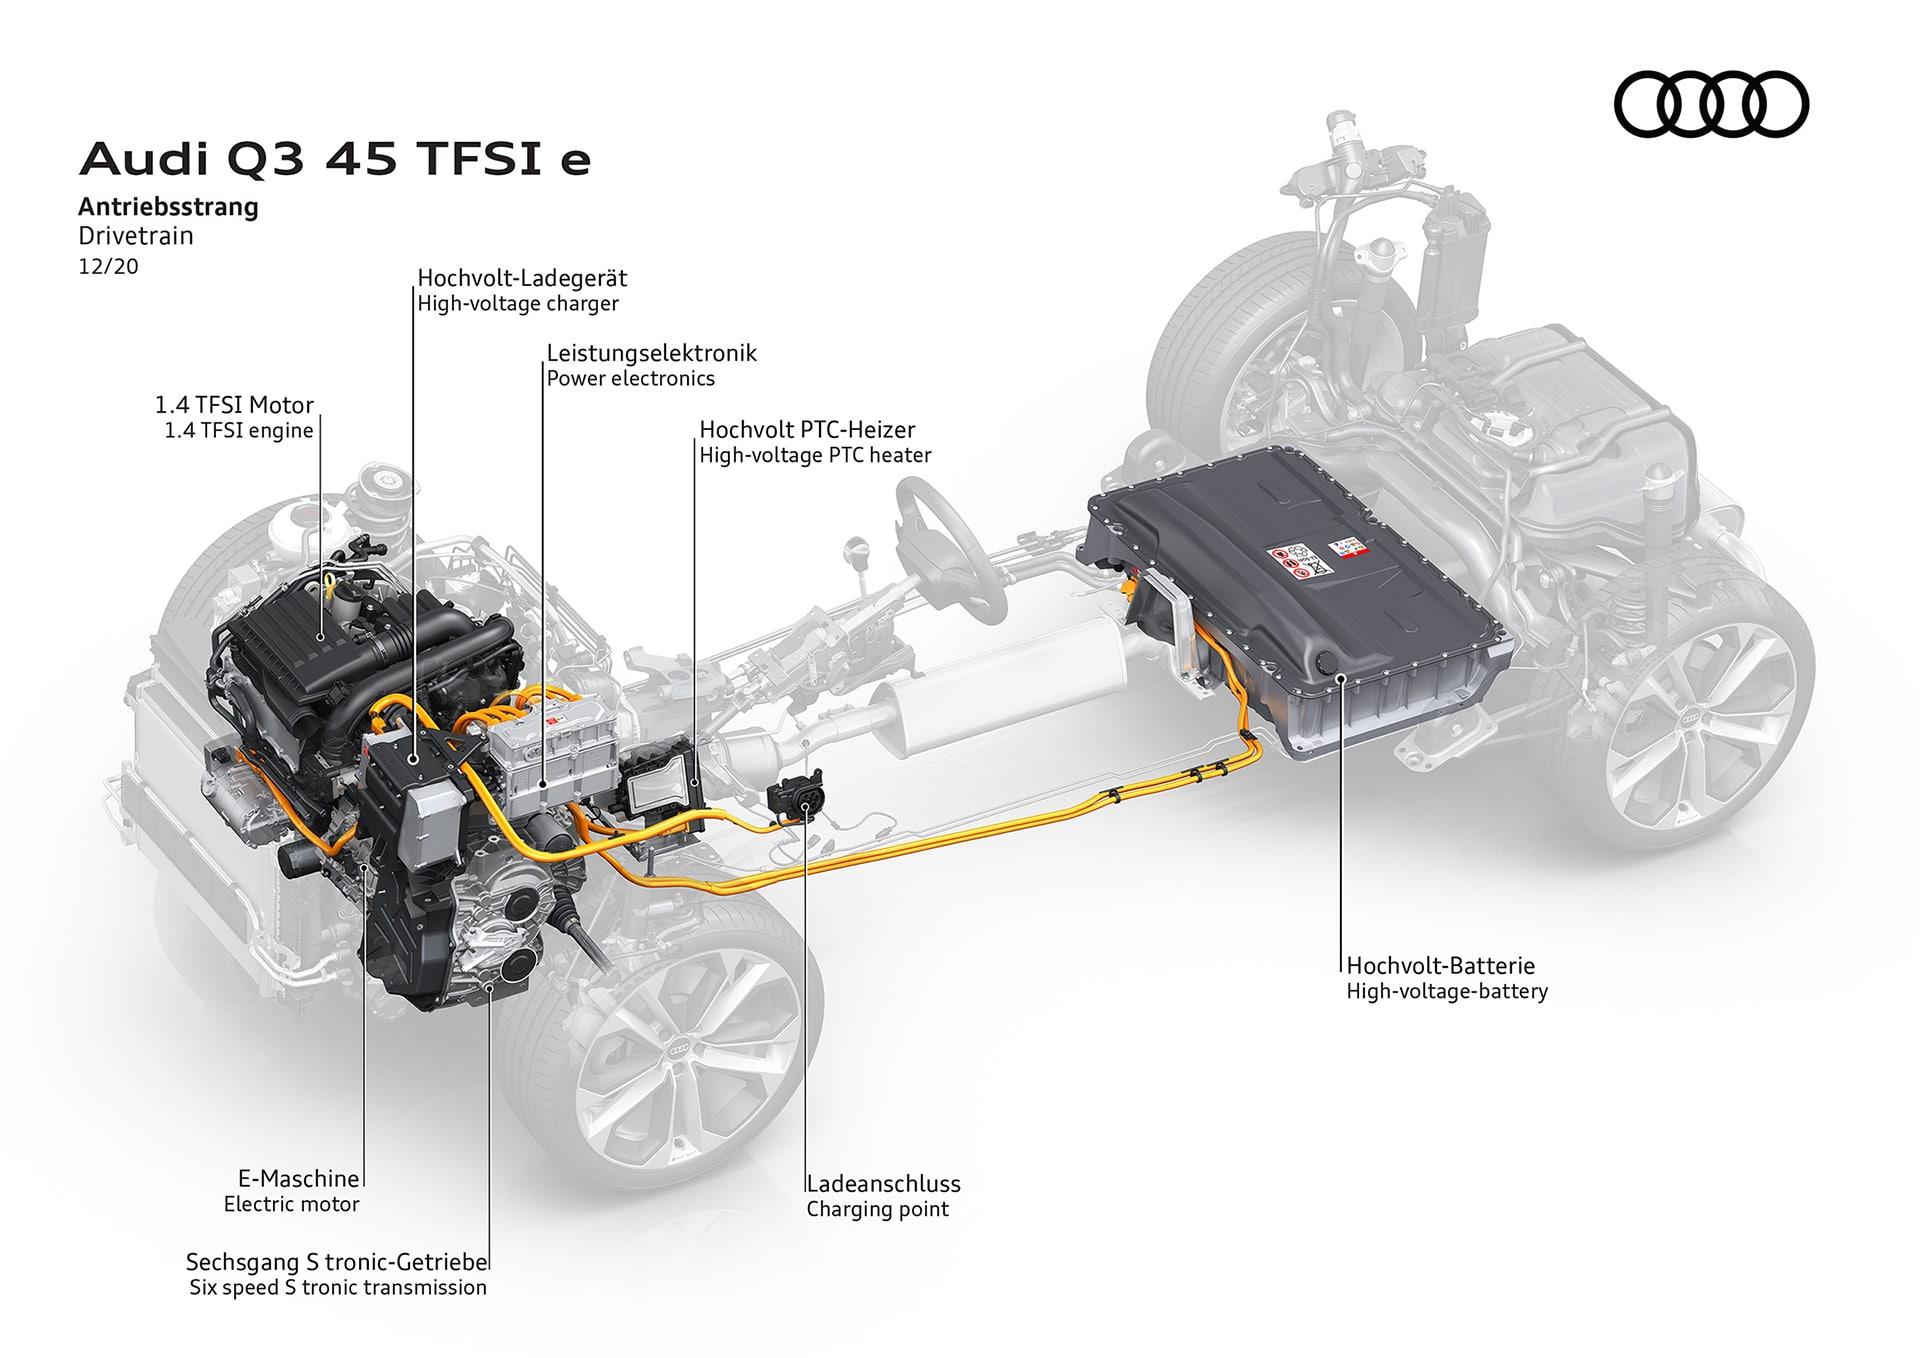 AUDI Q3 TFSI e 74 Αυτά είναι τα plug-in hybrid Audi Q3 TFSI e & Q3 Sportback TFSI e Audi, Audi Q3, Hybrid, plug-in hybrid, Q3, ειδήσεις, Νέα, υβριδικό